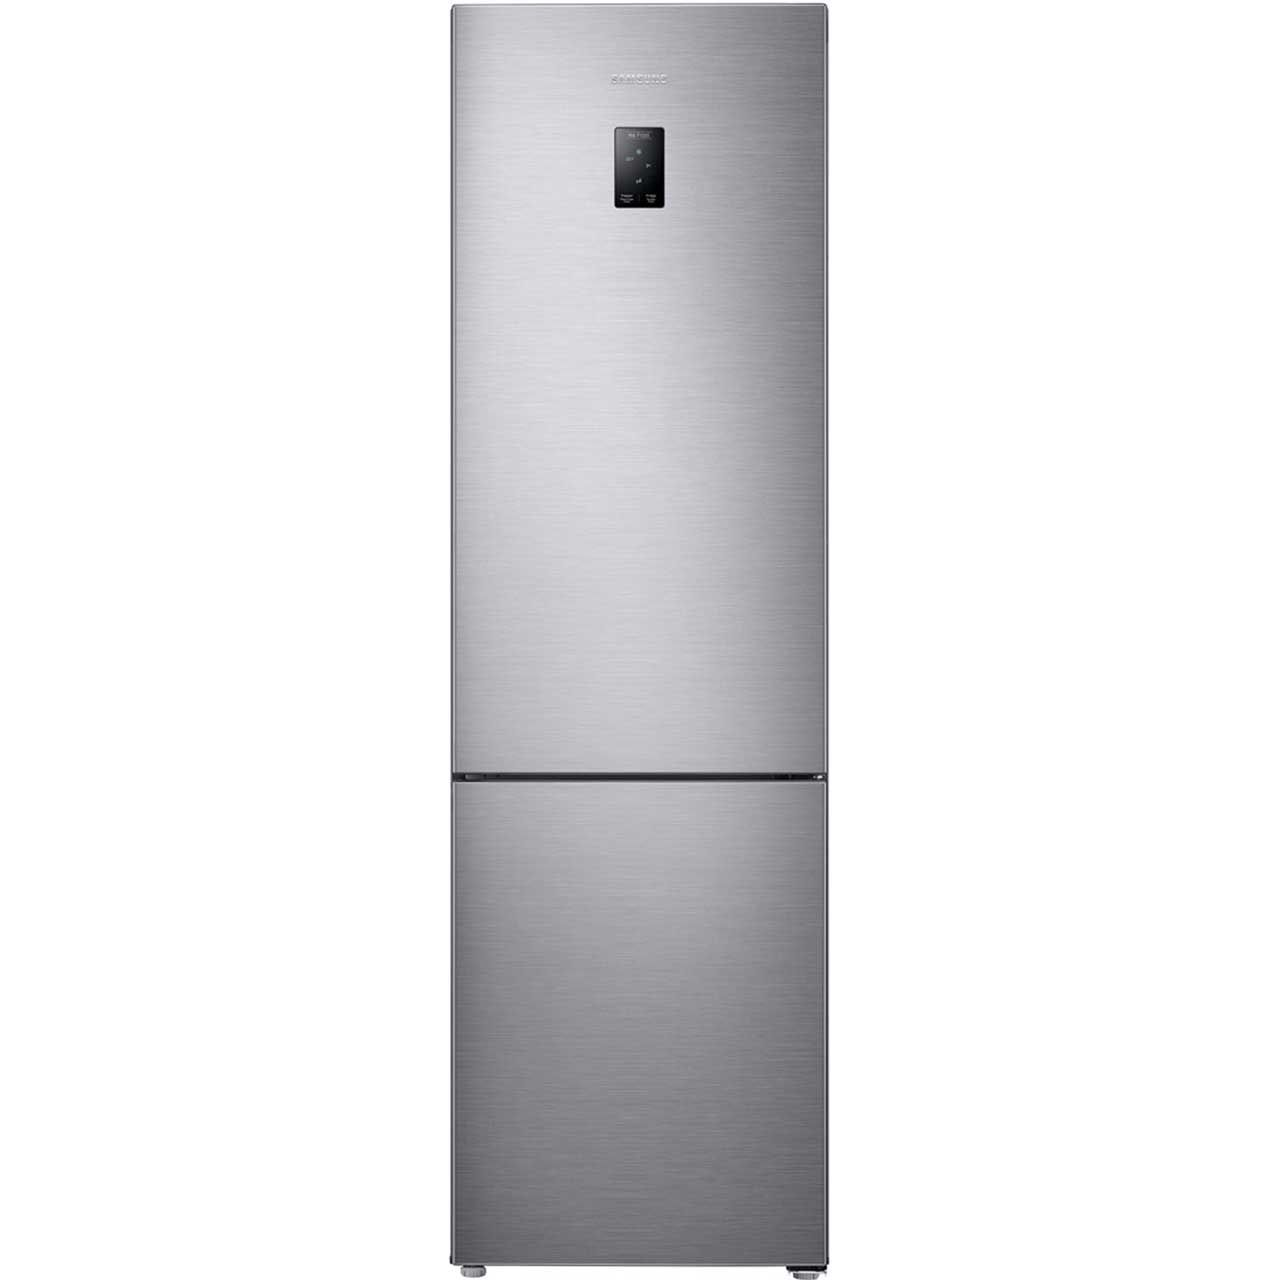 Samsung RB Combi Range RB37J5230SS 60/40 Frost Free Fridge